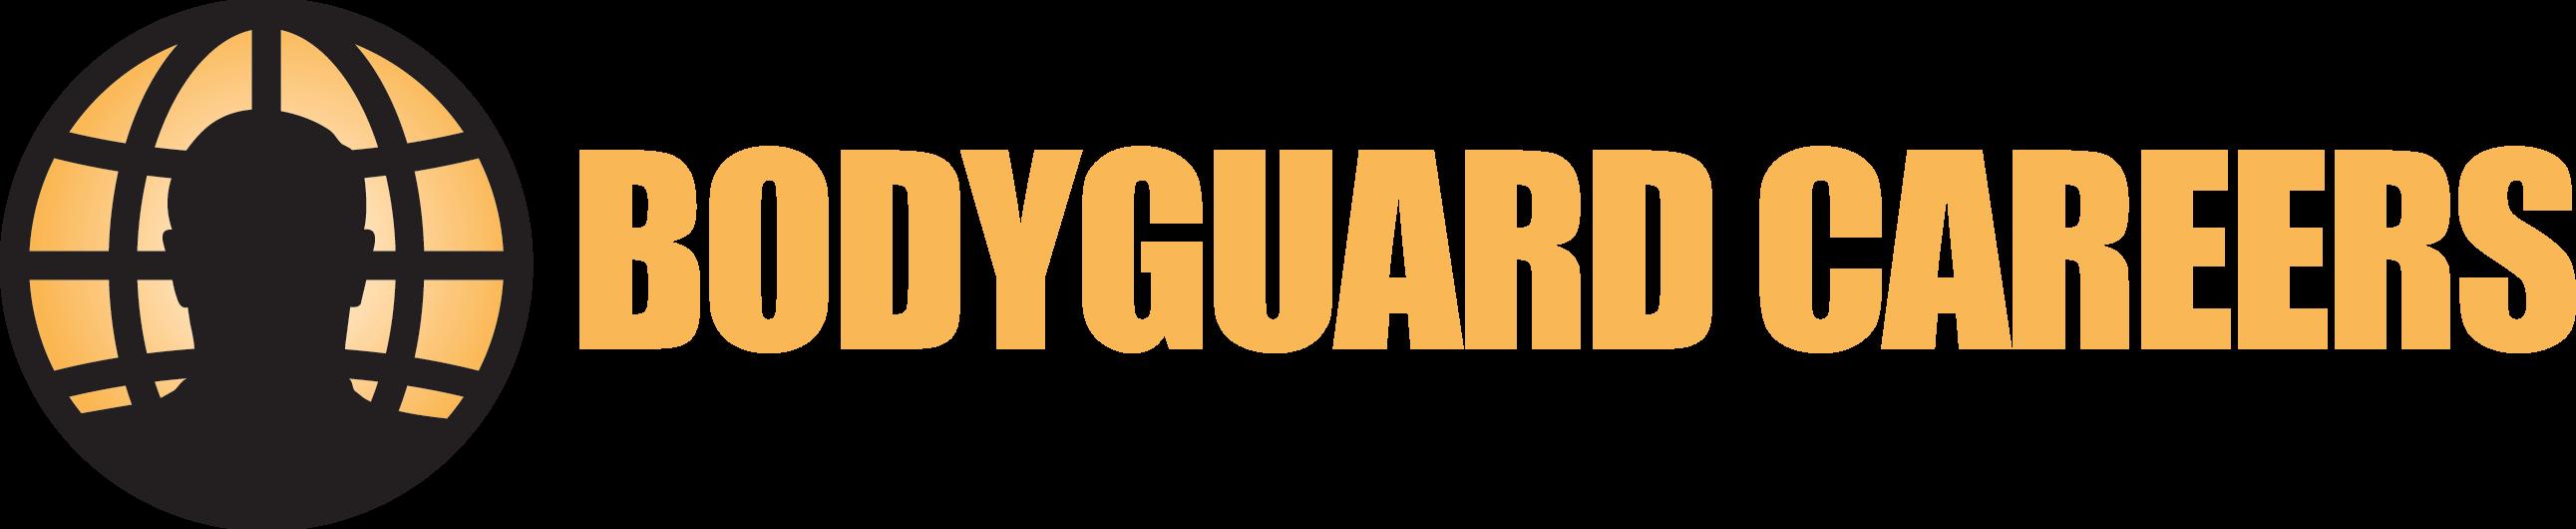 Bodyguard Careers